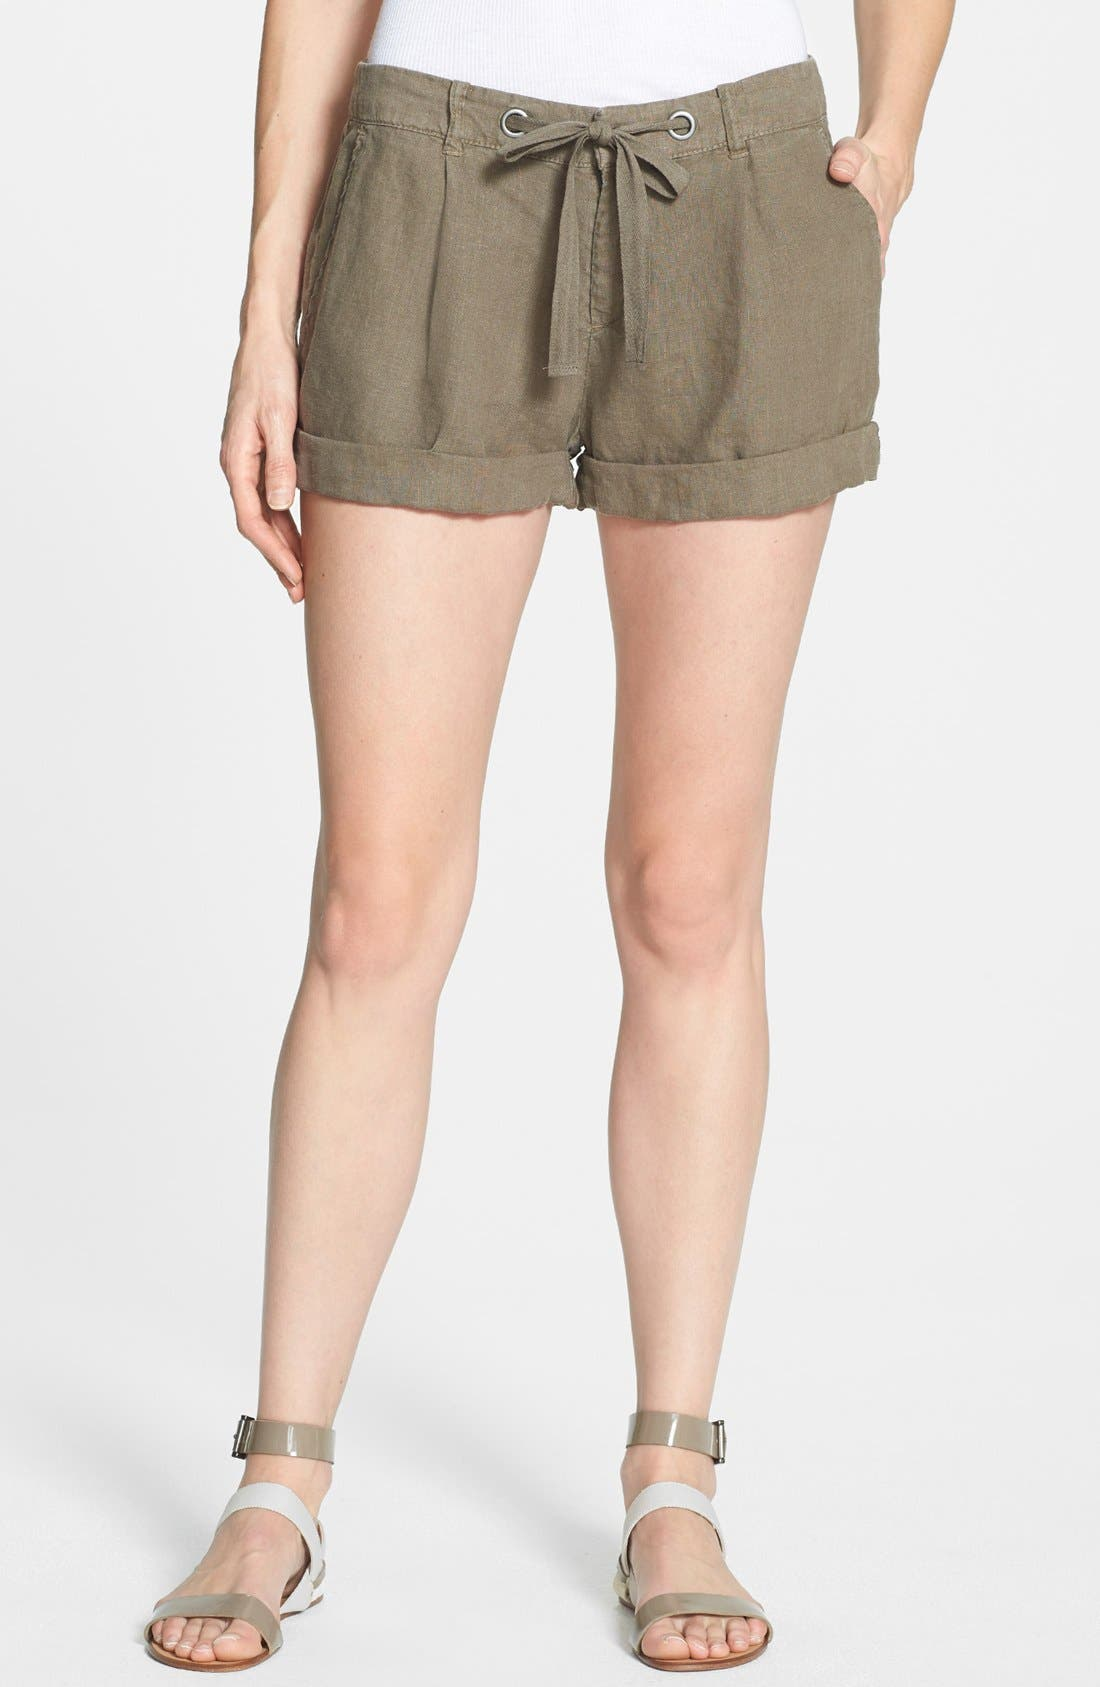 Alternate Image 1 Selected - Joie 'Farrow' Linen Shorts